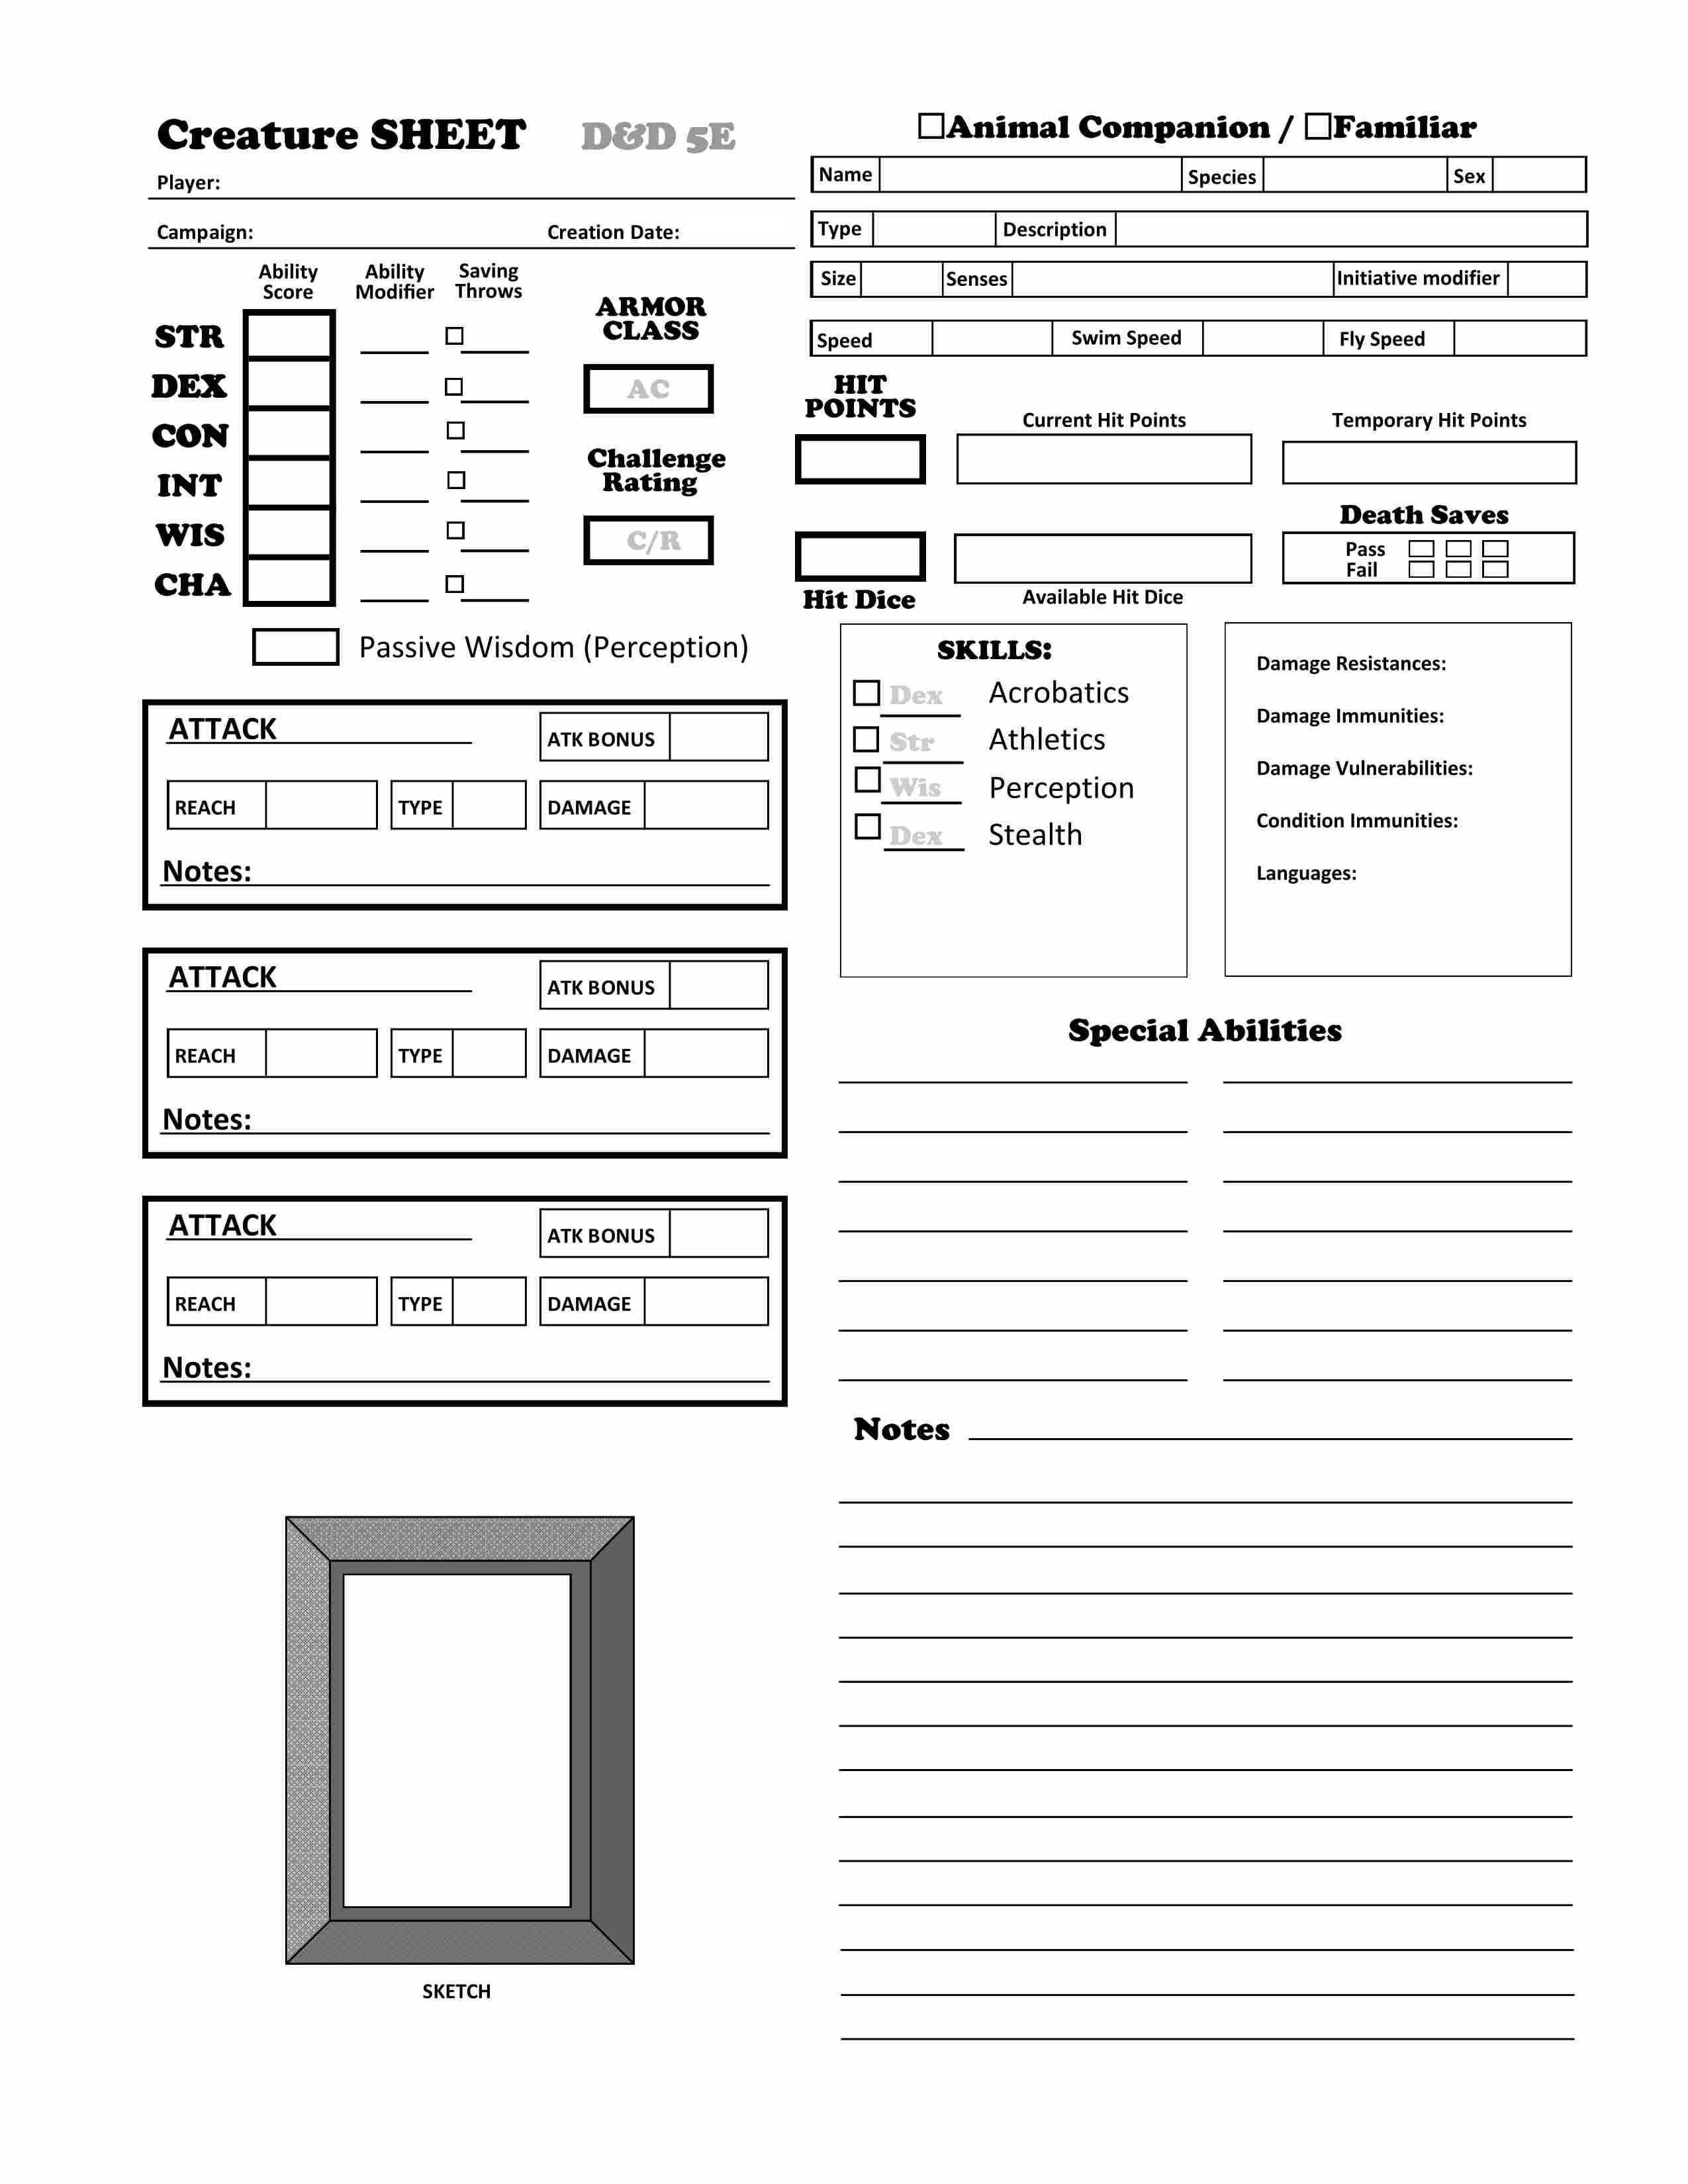 Https Olddungeonmaster Files Wordpress Com 2014 08 5 0 Crs Animal Sheet Rrh1 Jpg Animal Companions Pathfinder Character Sheet Dnd Character Sheet